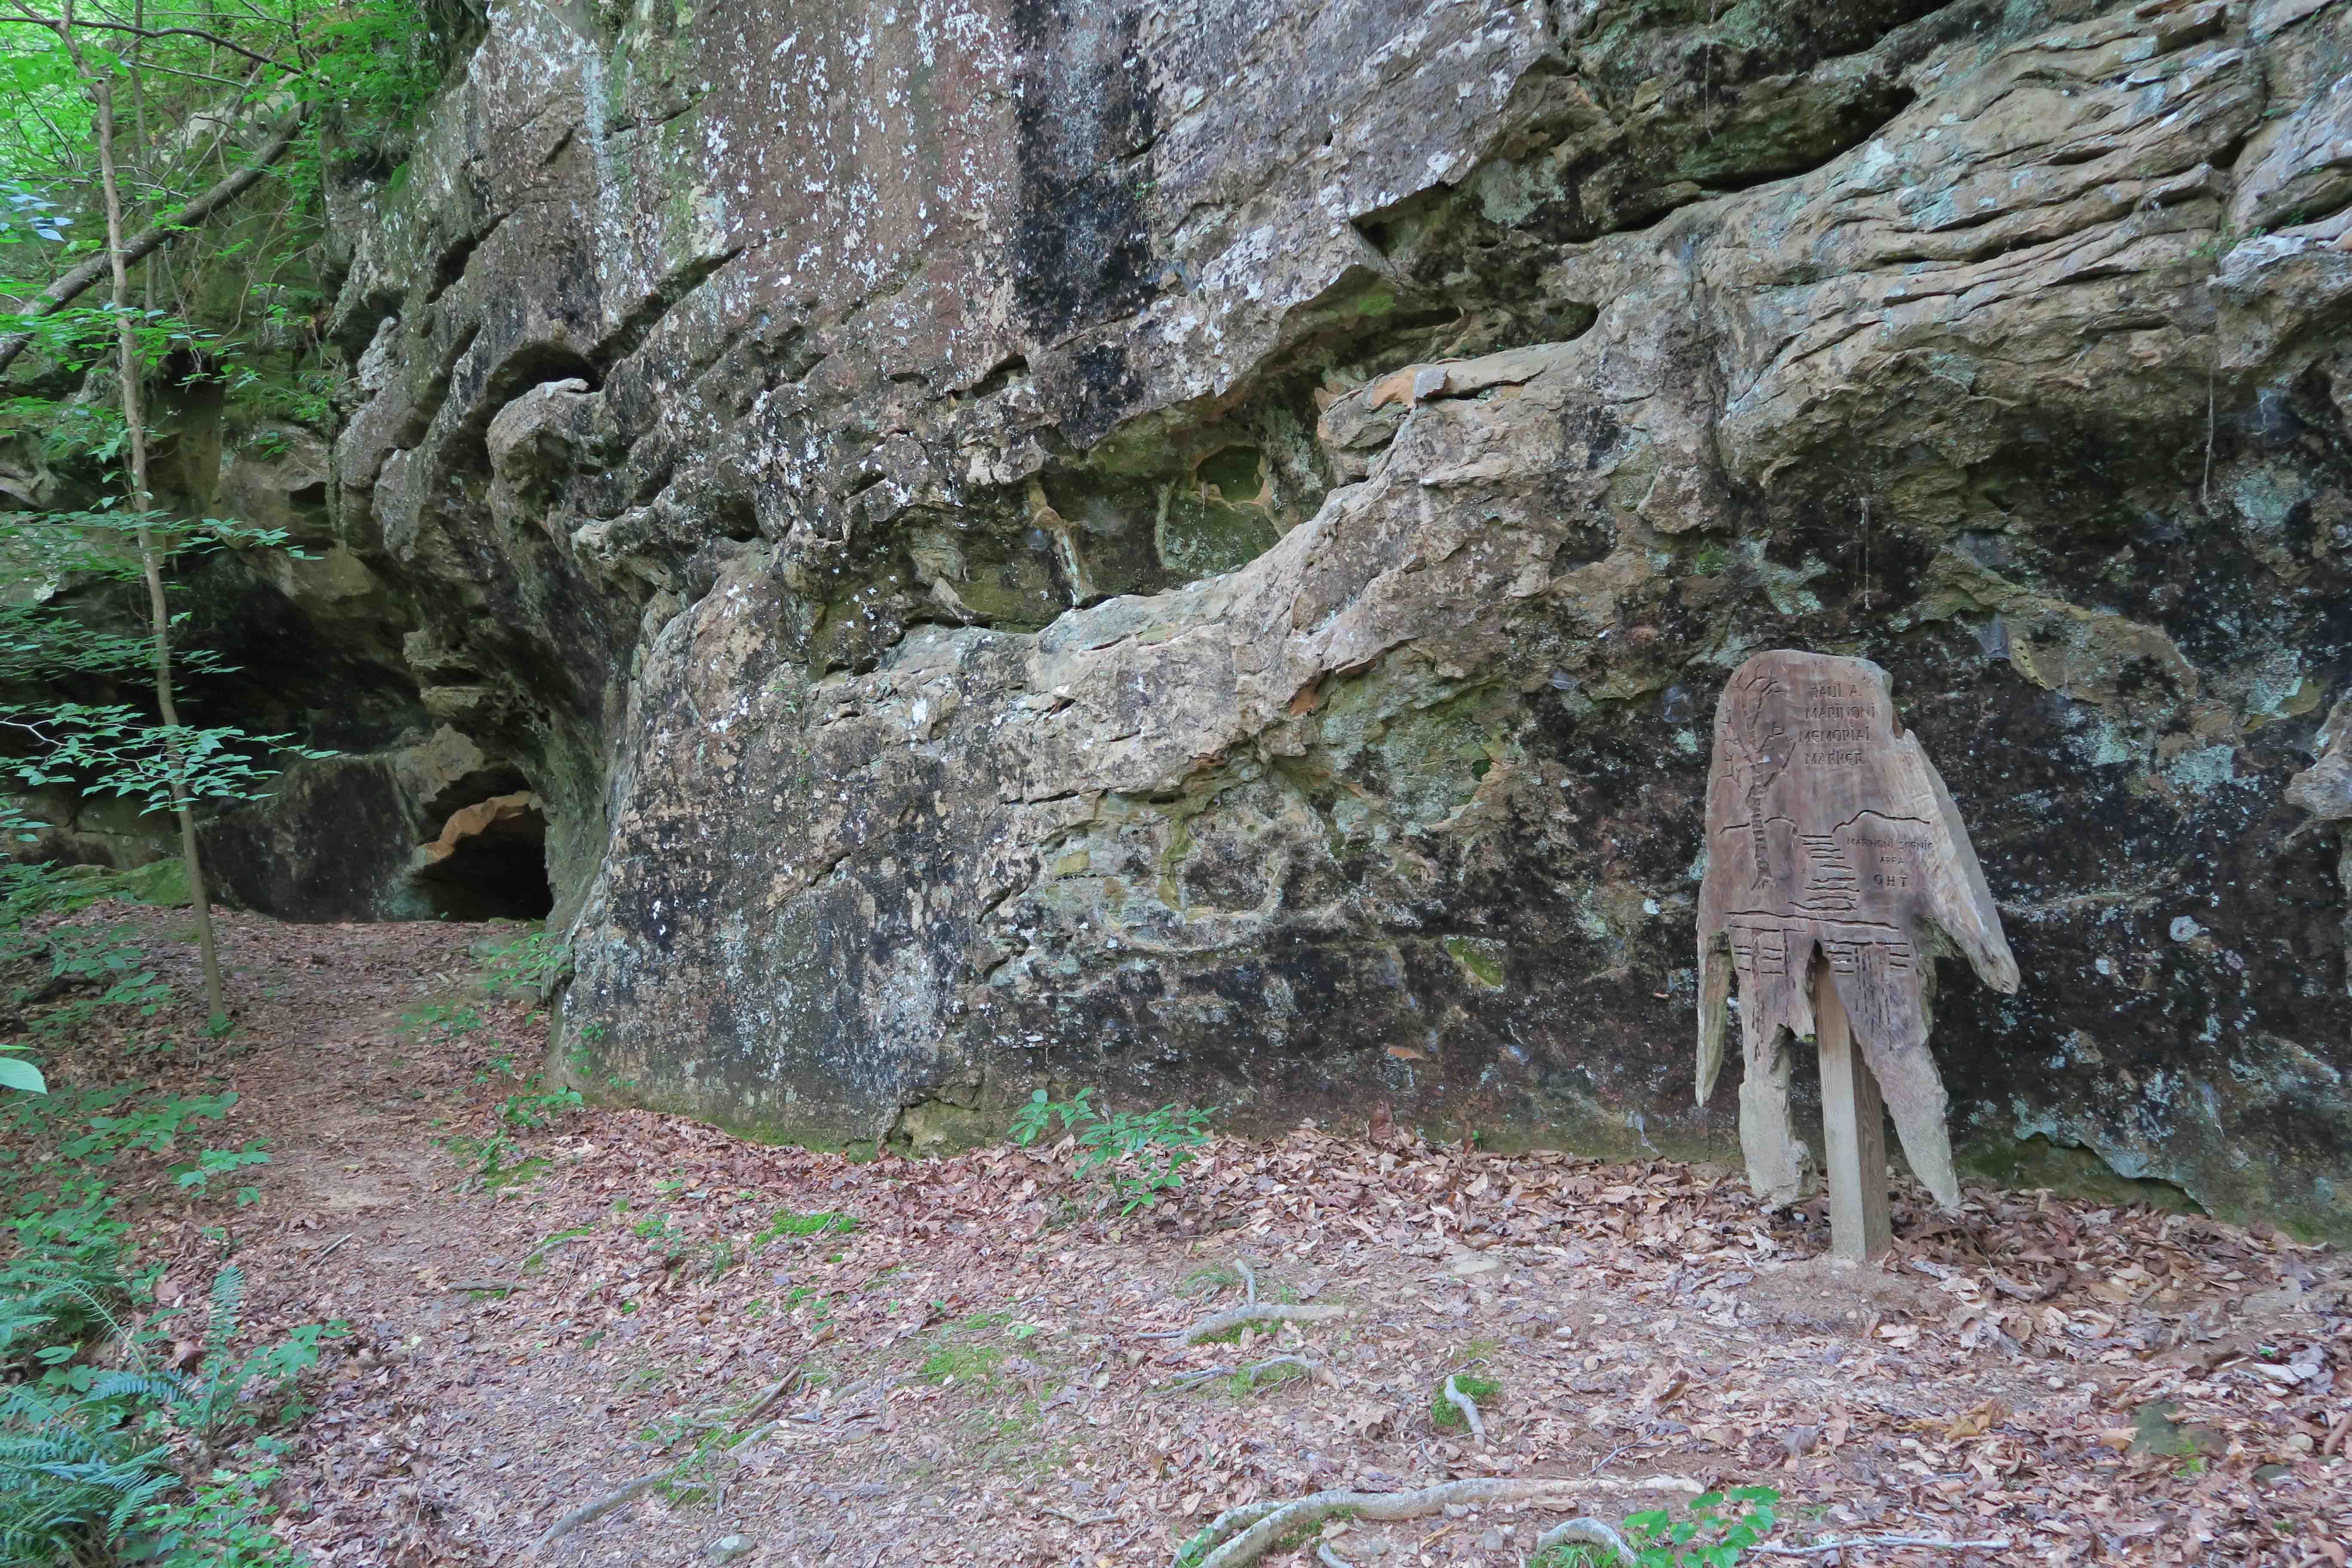 exploring arkansas features the marinoni scenic area in